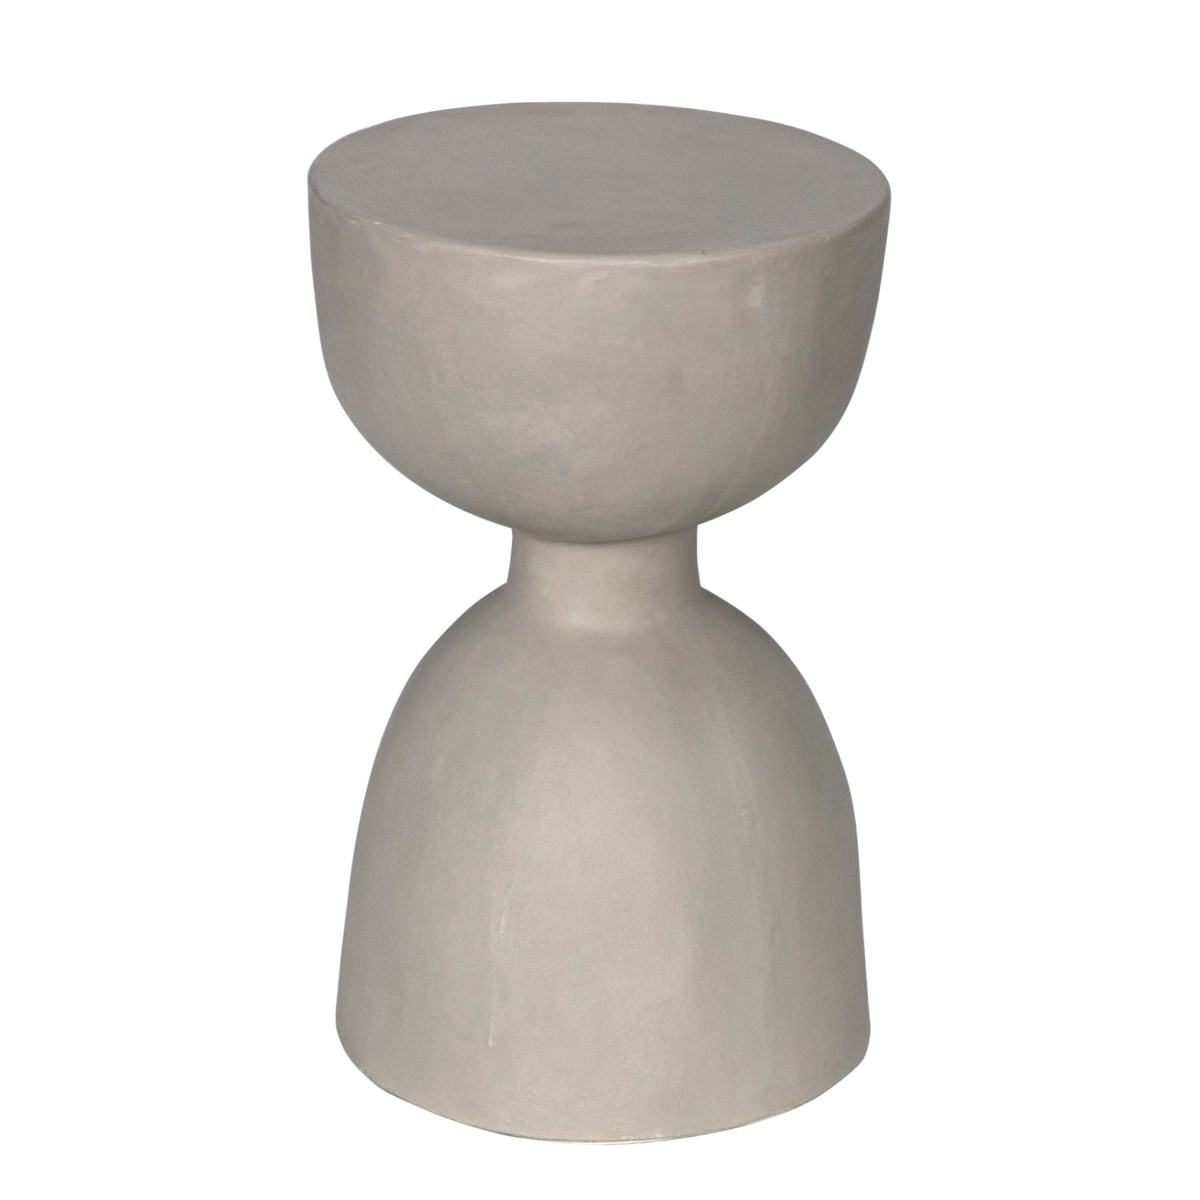 Hourglass Stool, Fiber Cement